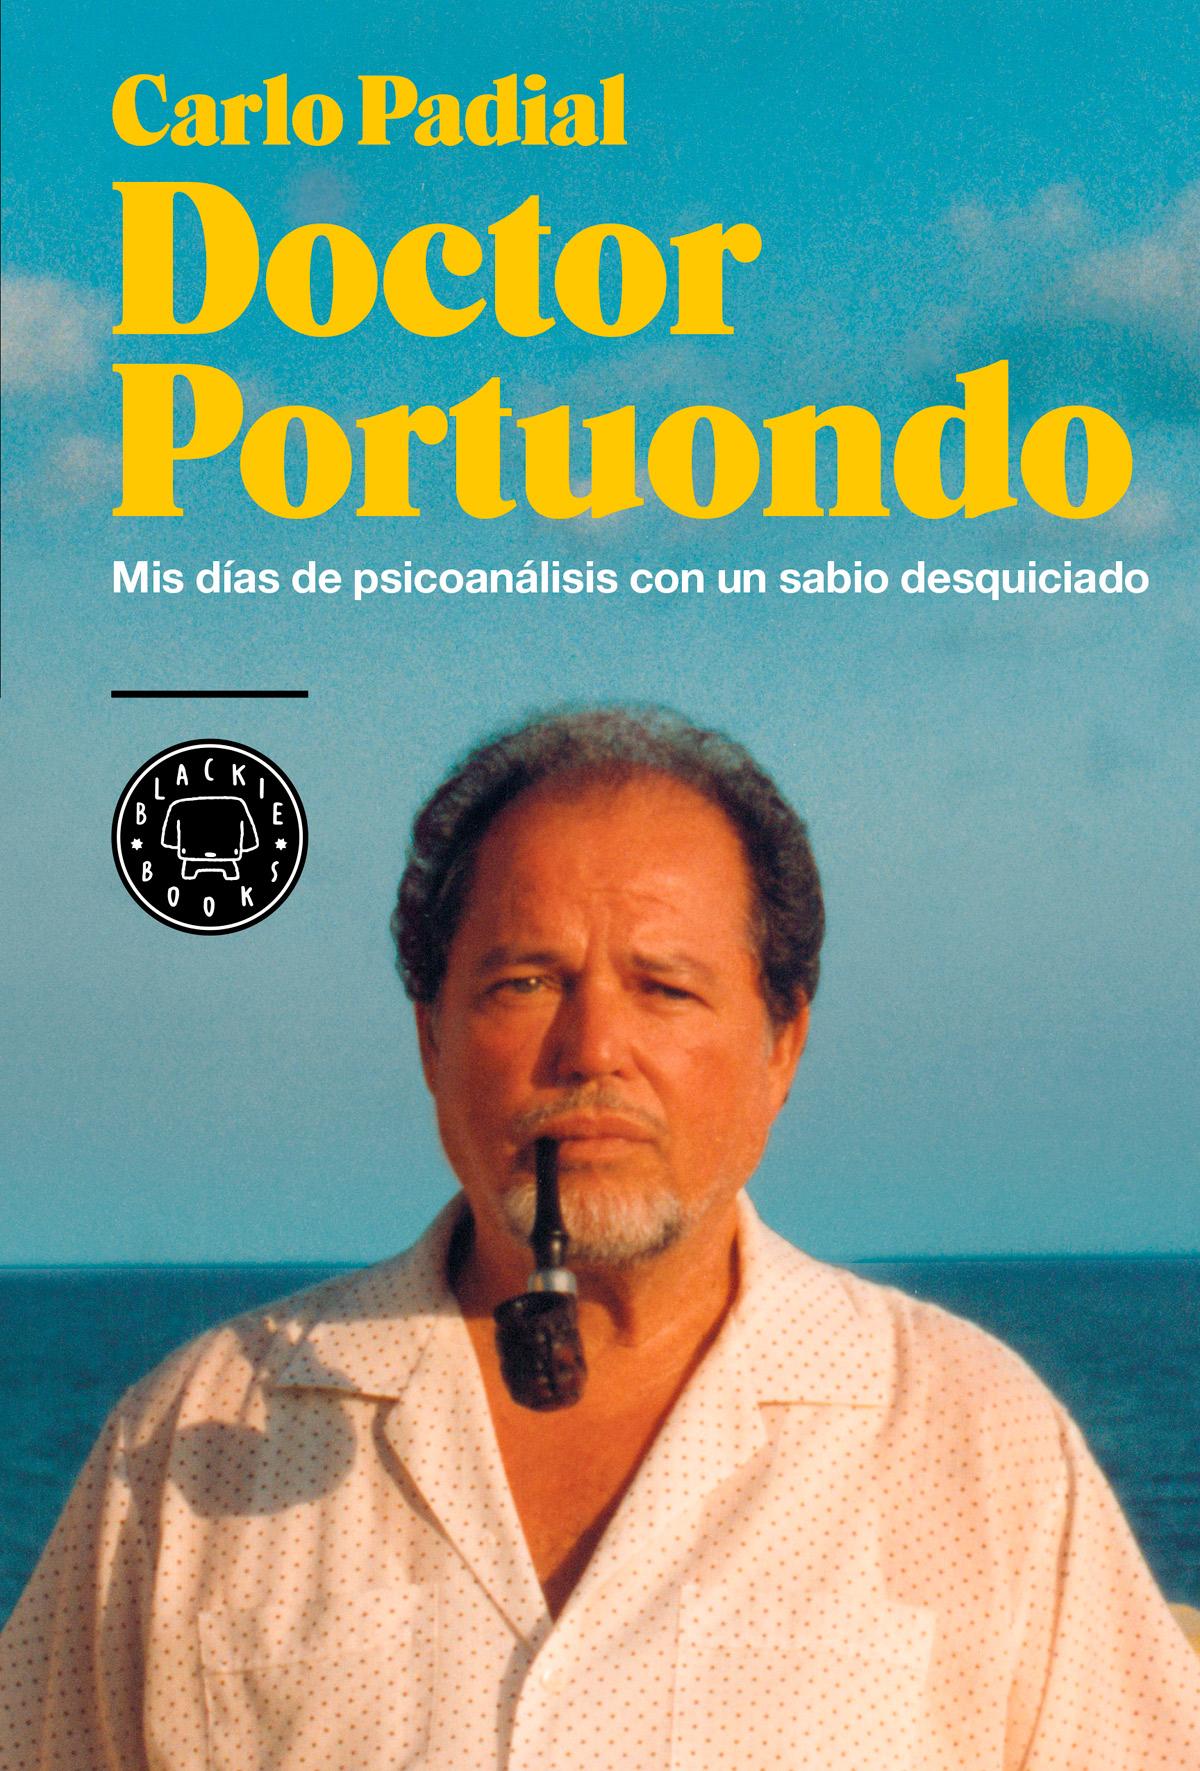 Carlo-Padial-portada-doctor-portuondo